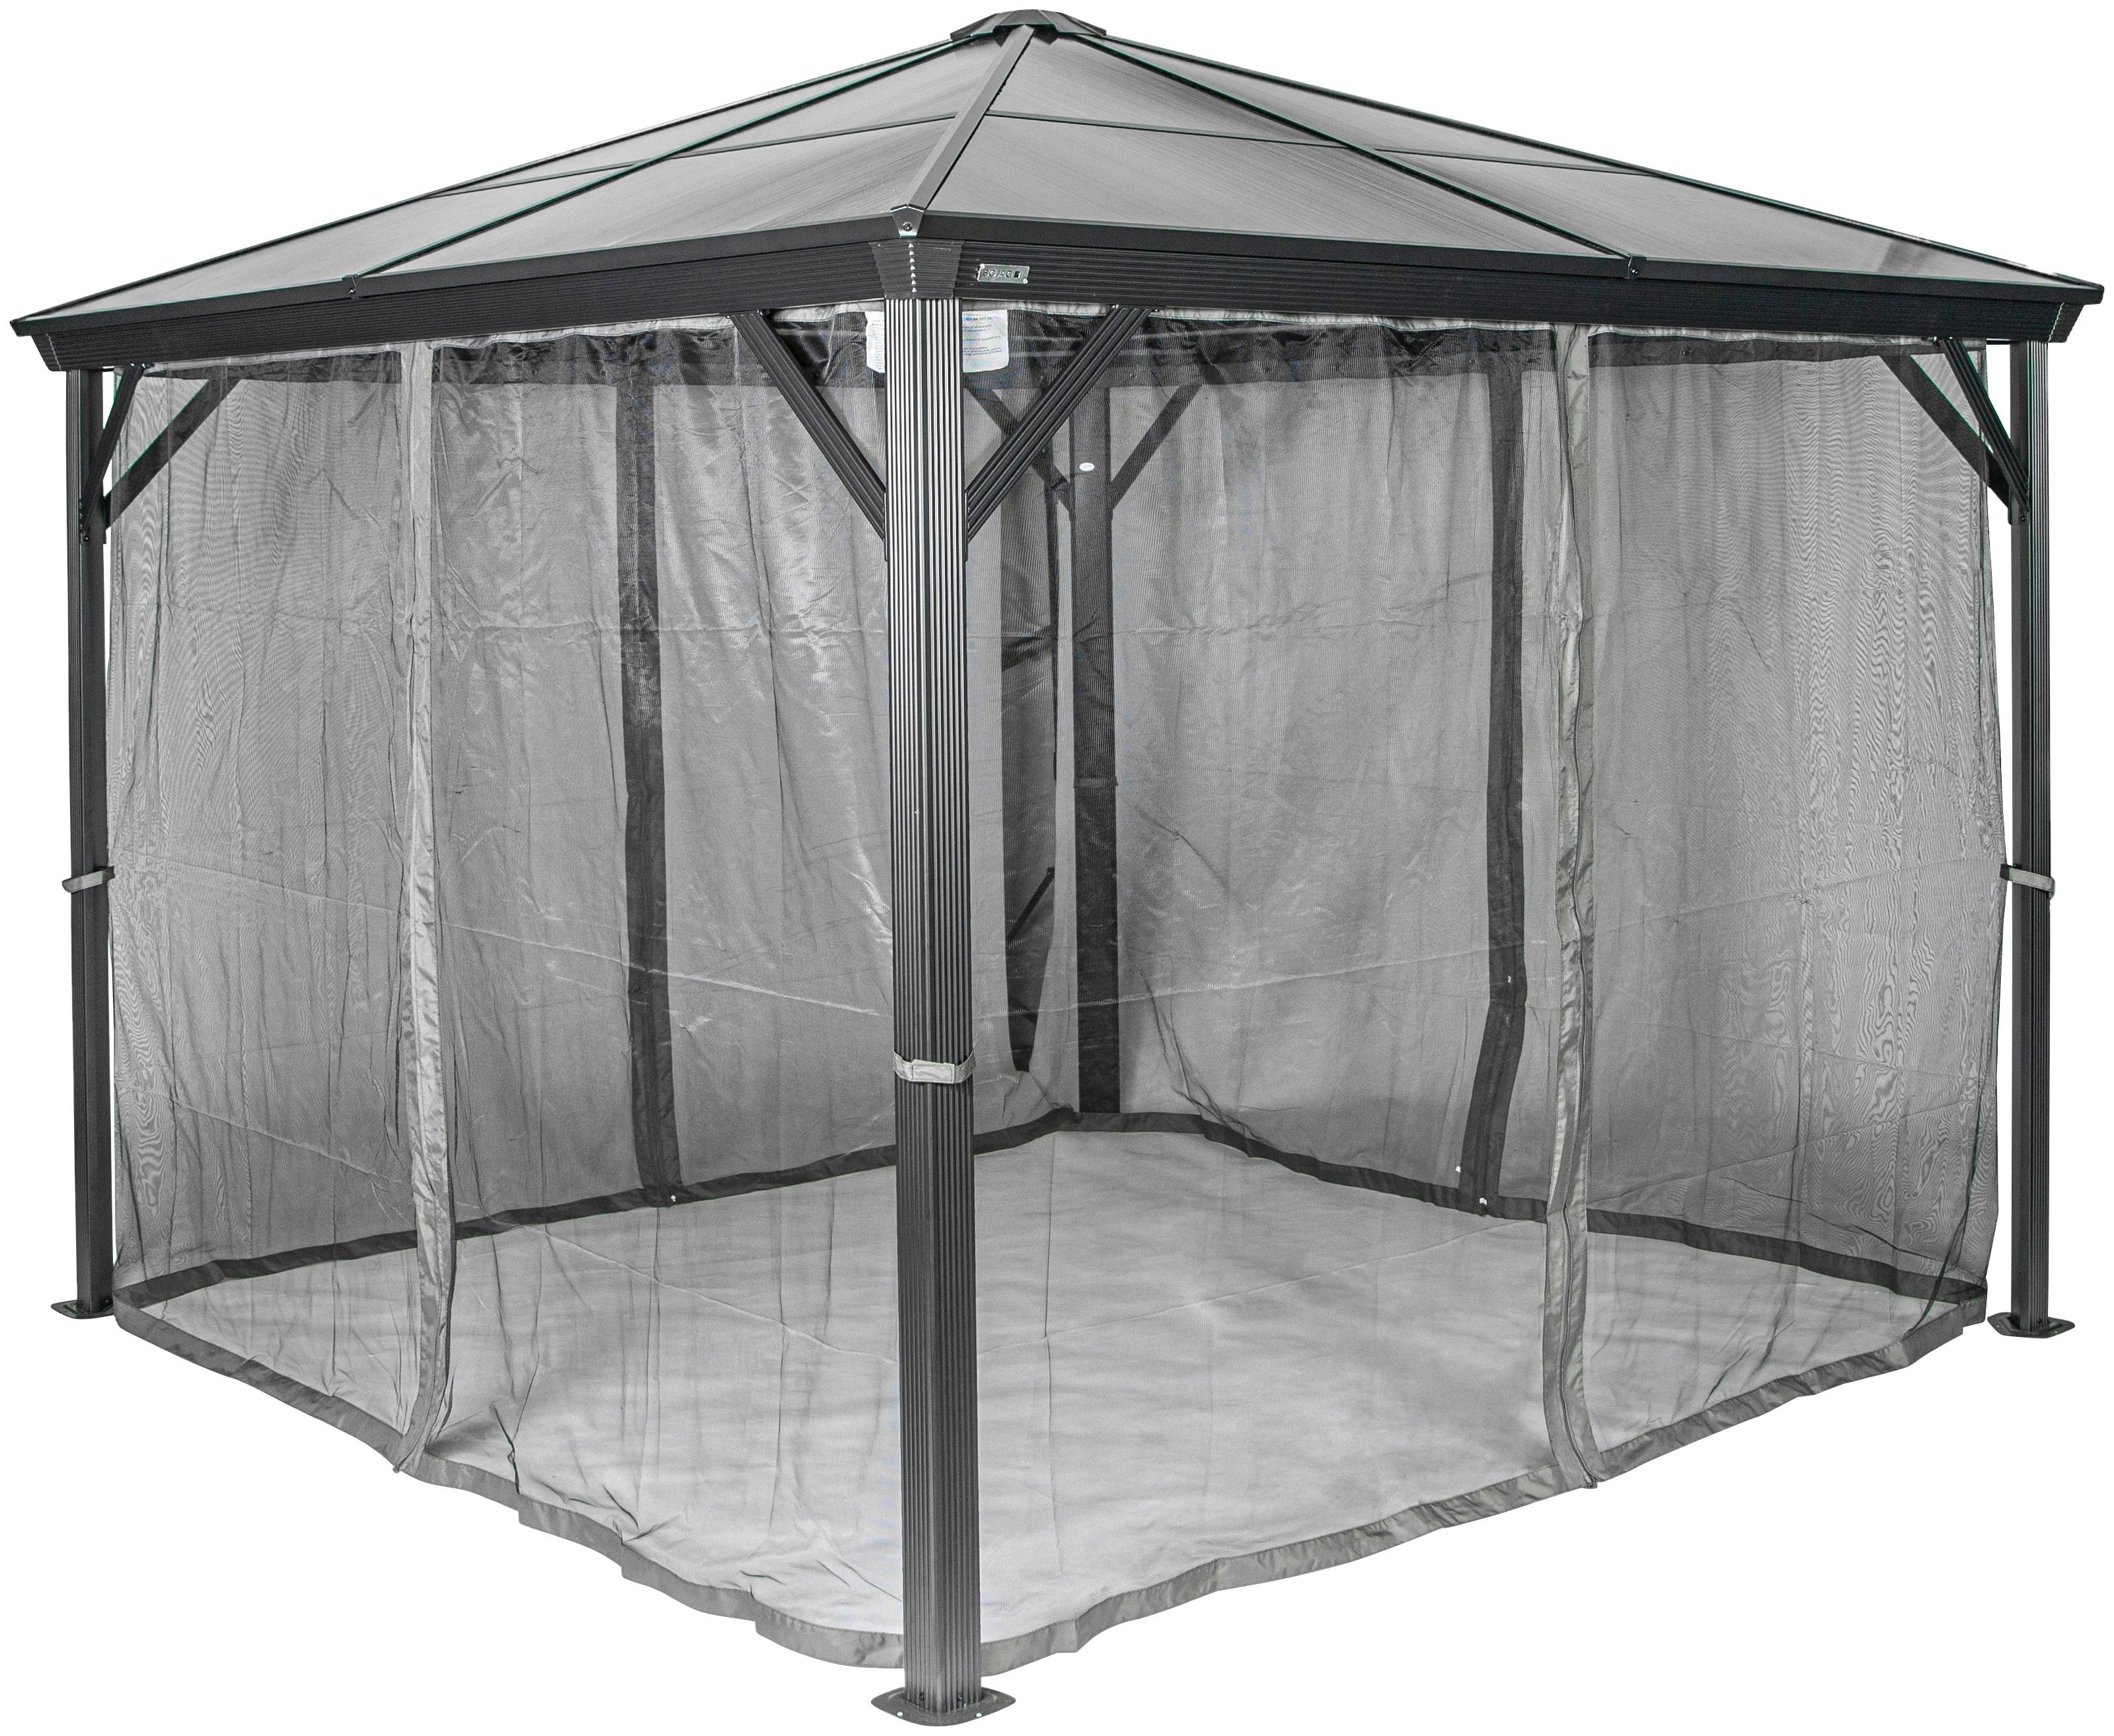 Sojag Pavillon Verona 10x14, BxT: 423x298 cm günstig online kaufen